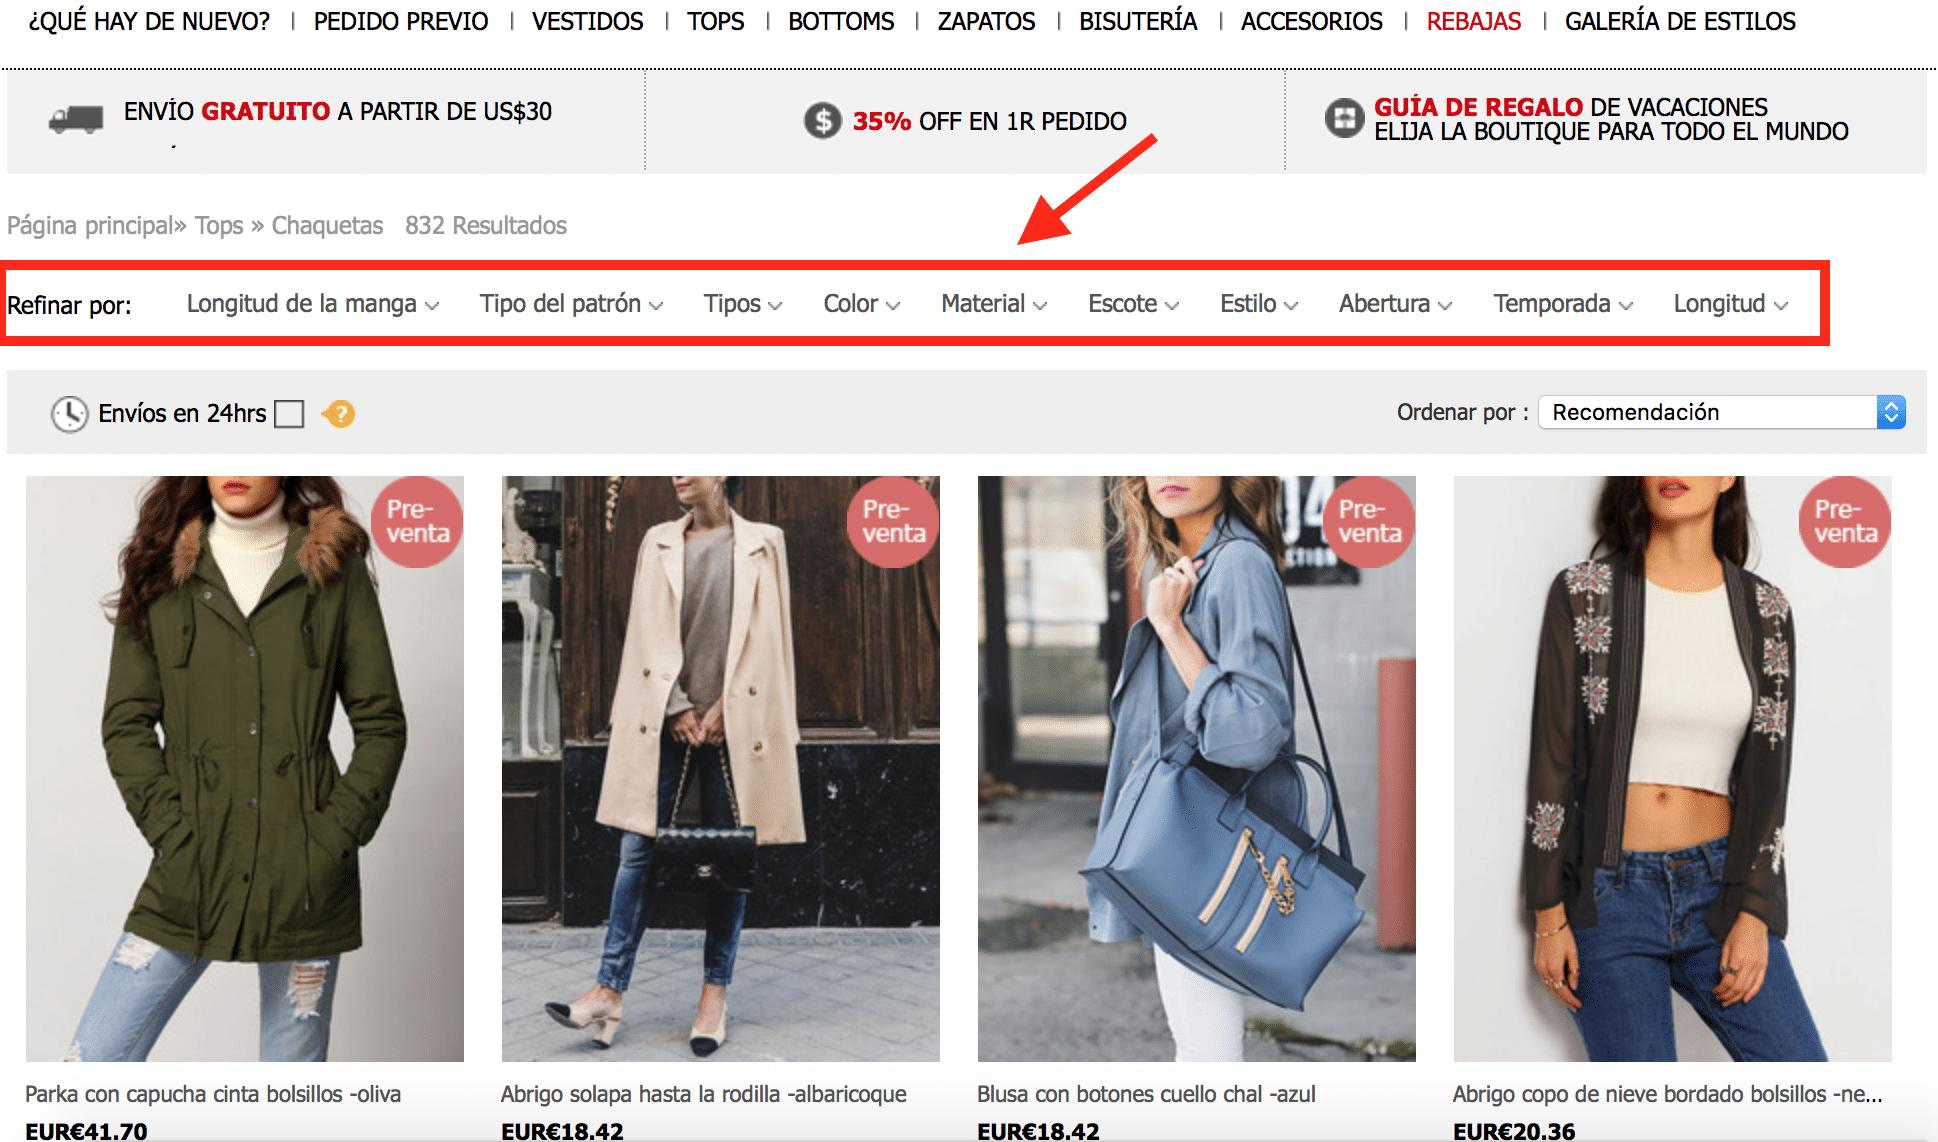 trucos para encontrar ropa barata en sheinside